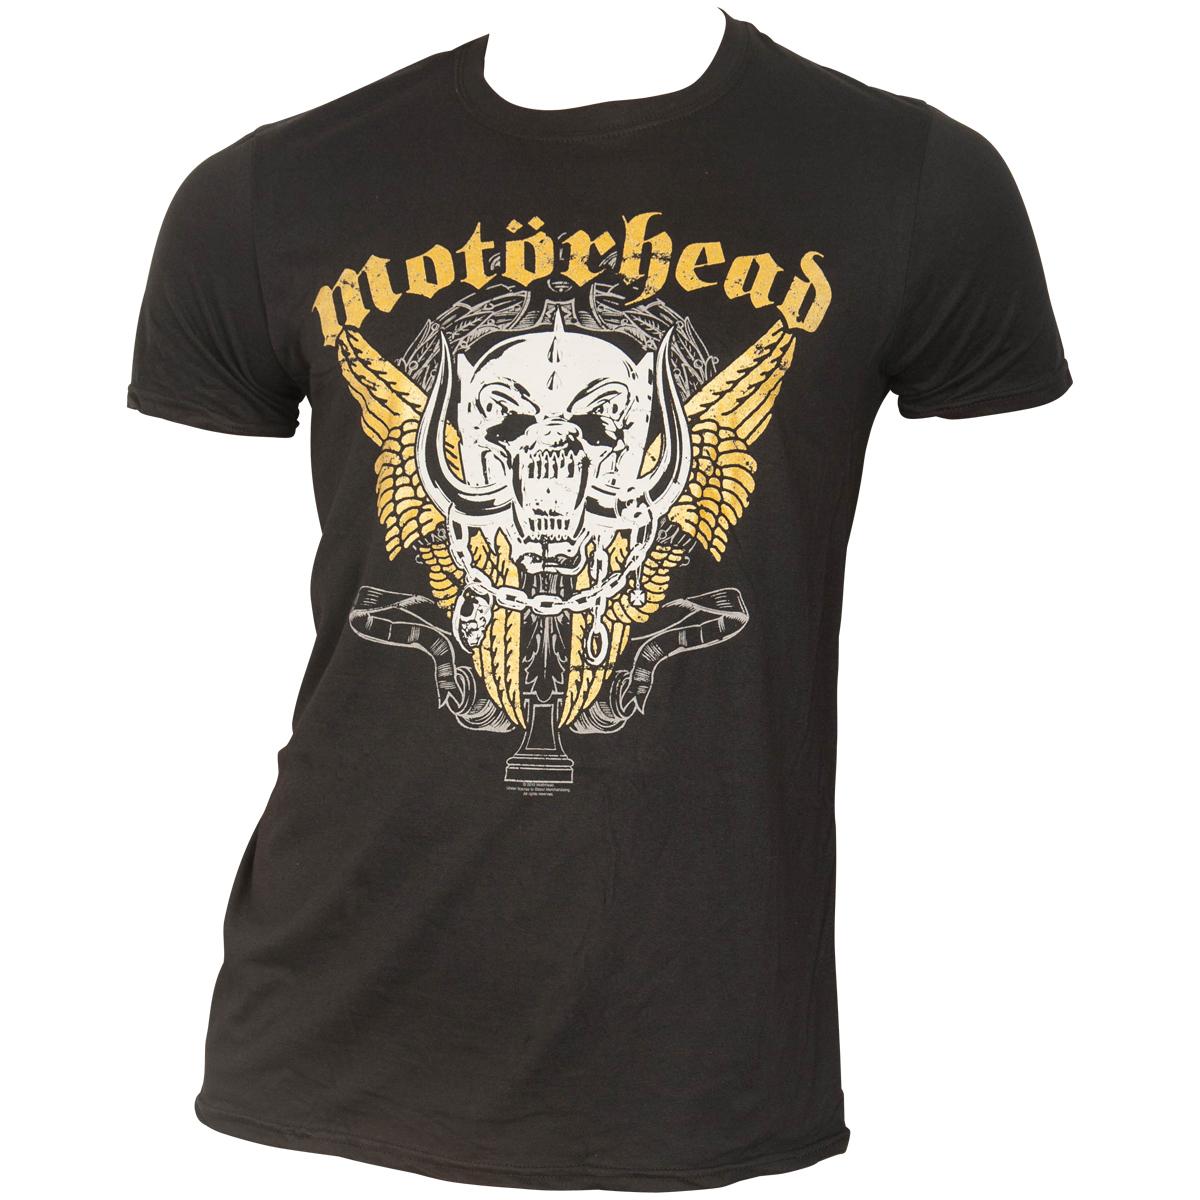 Motörhead - T-Shirt Wings - schwarz